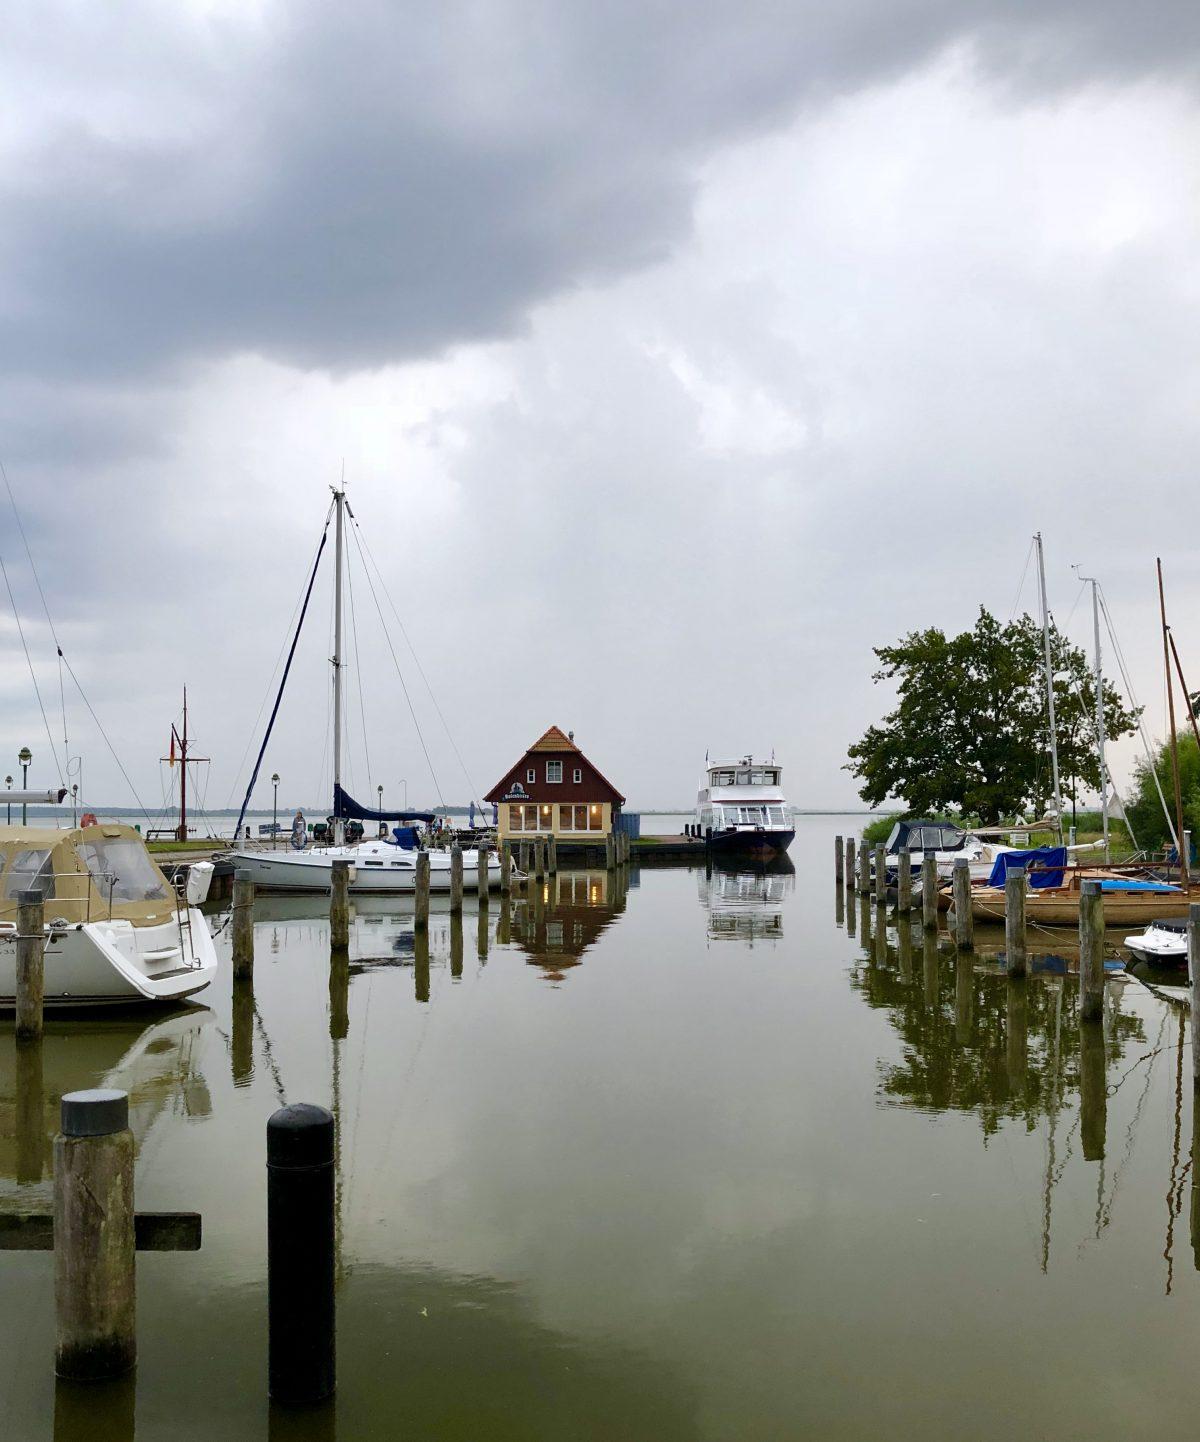 Sommerferien, Ostsee Edition | berlinmittemom.com